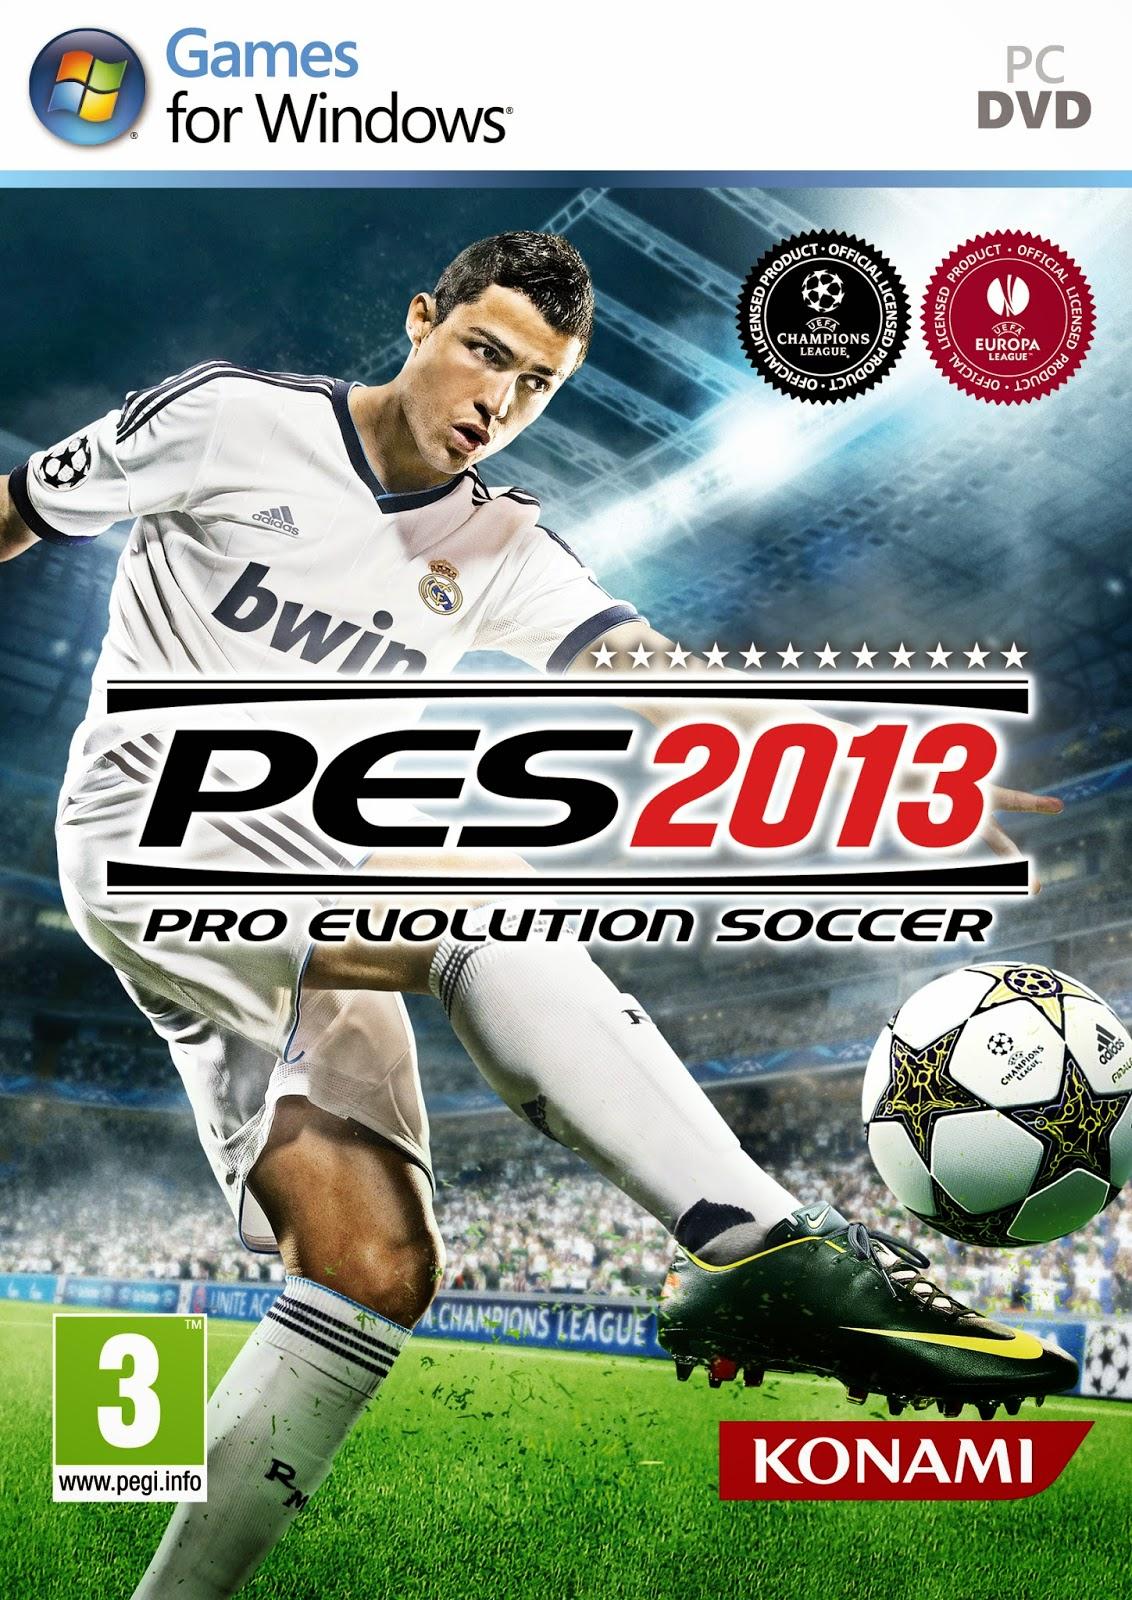 Download PES 2013 Full Version